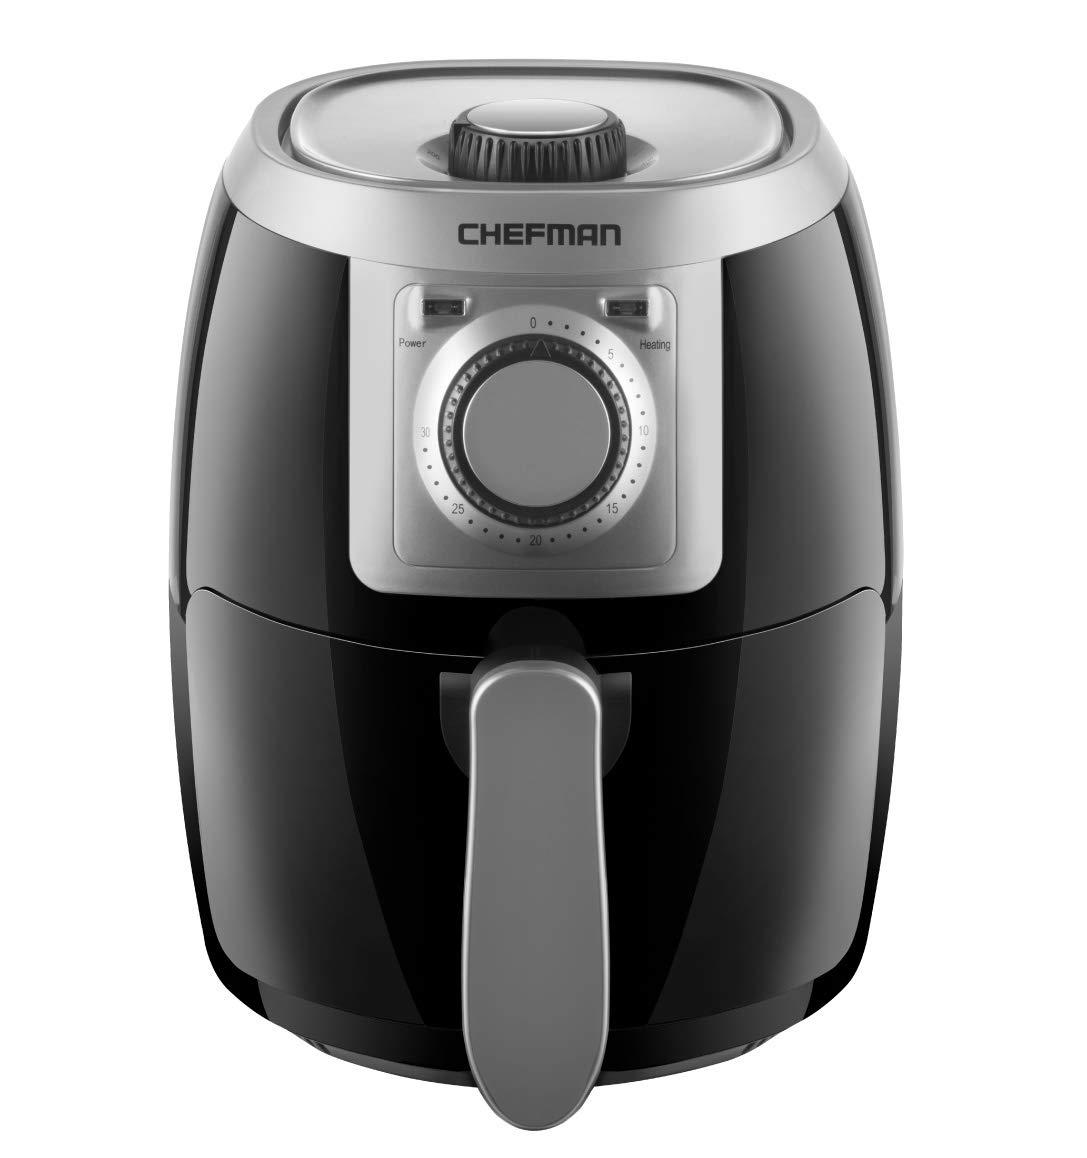 Chefman TurboFry Liter Air Fryer